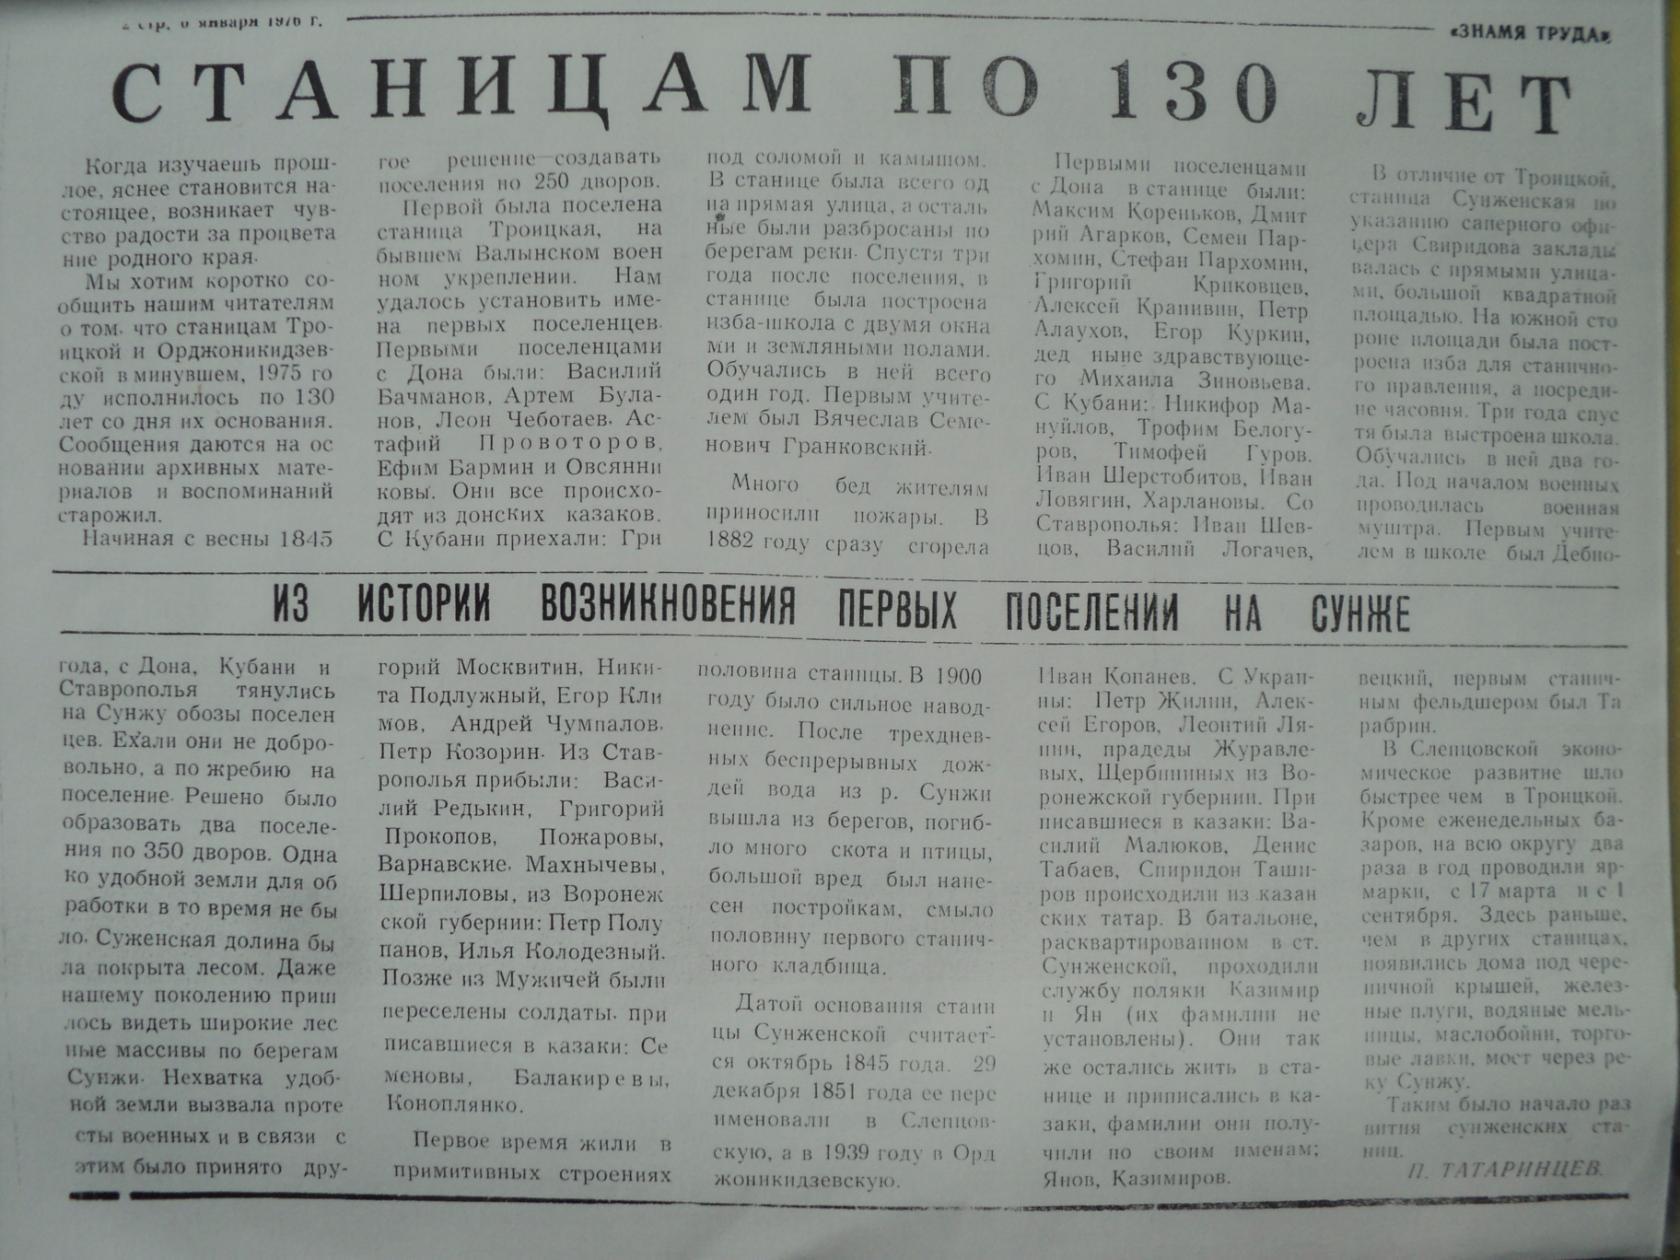 http://s5.uploads.ru/Swpyt.jpg